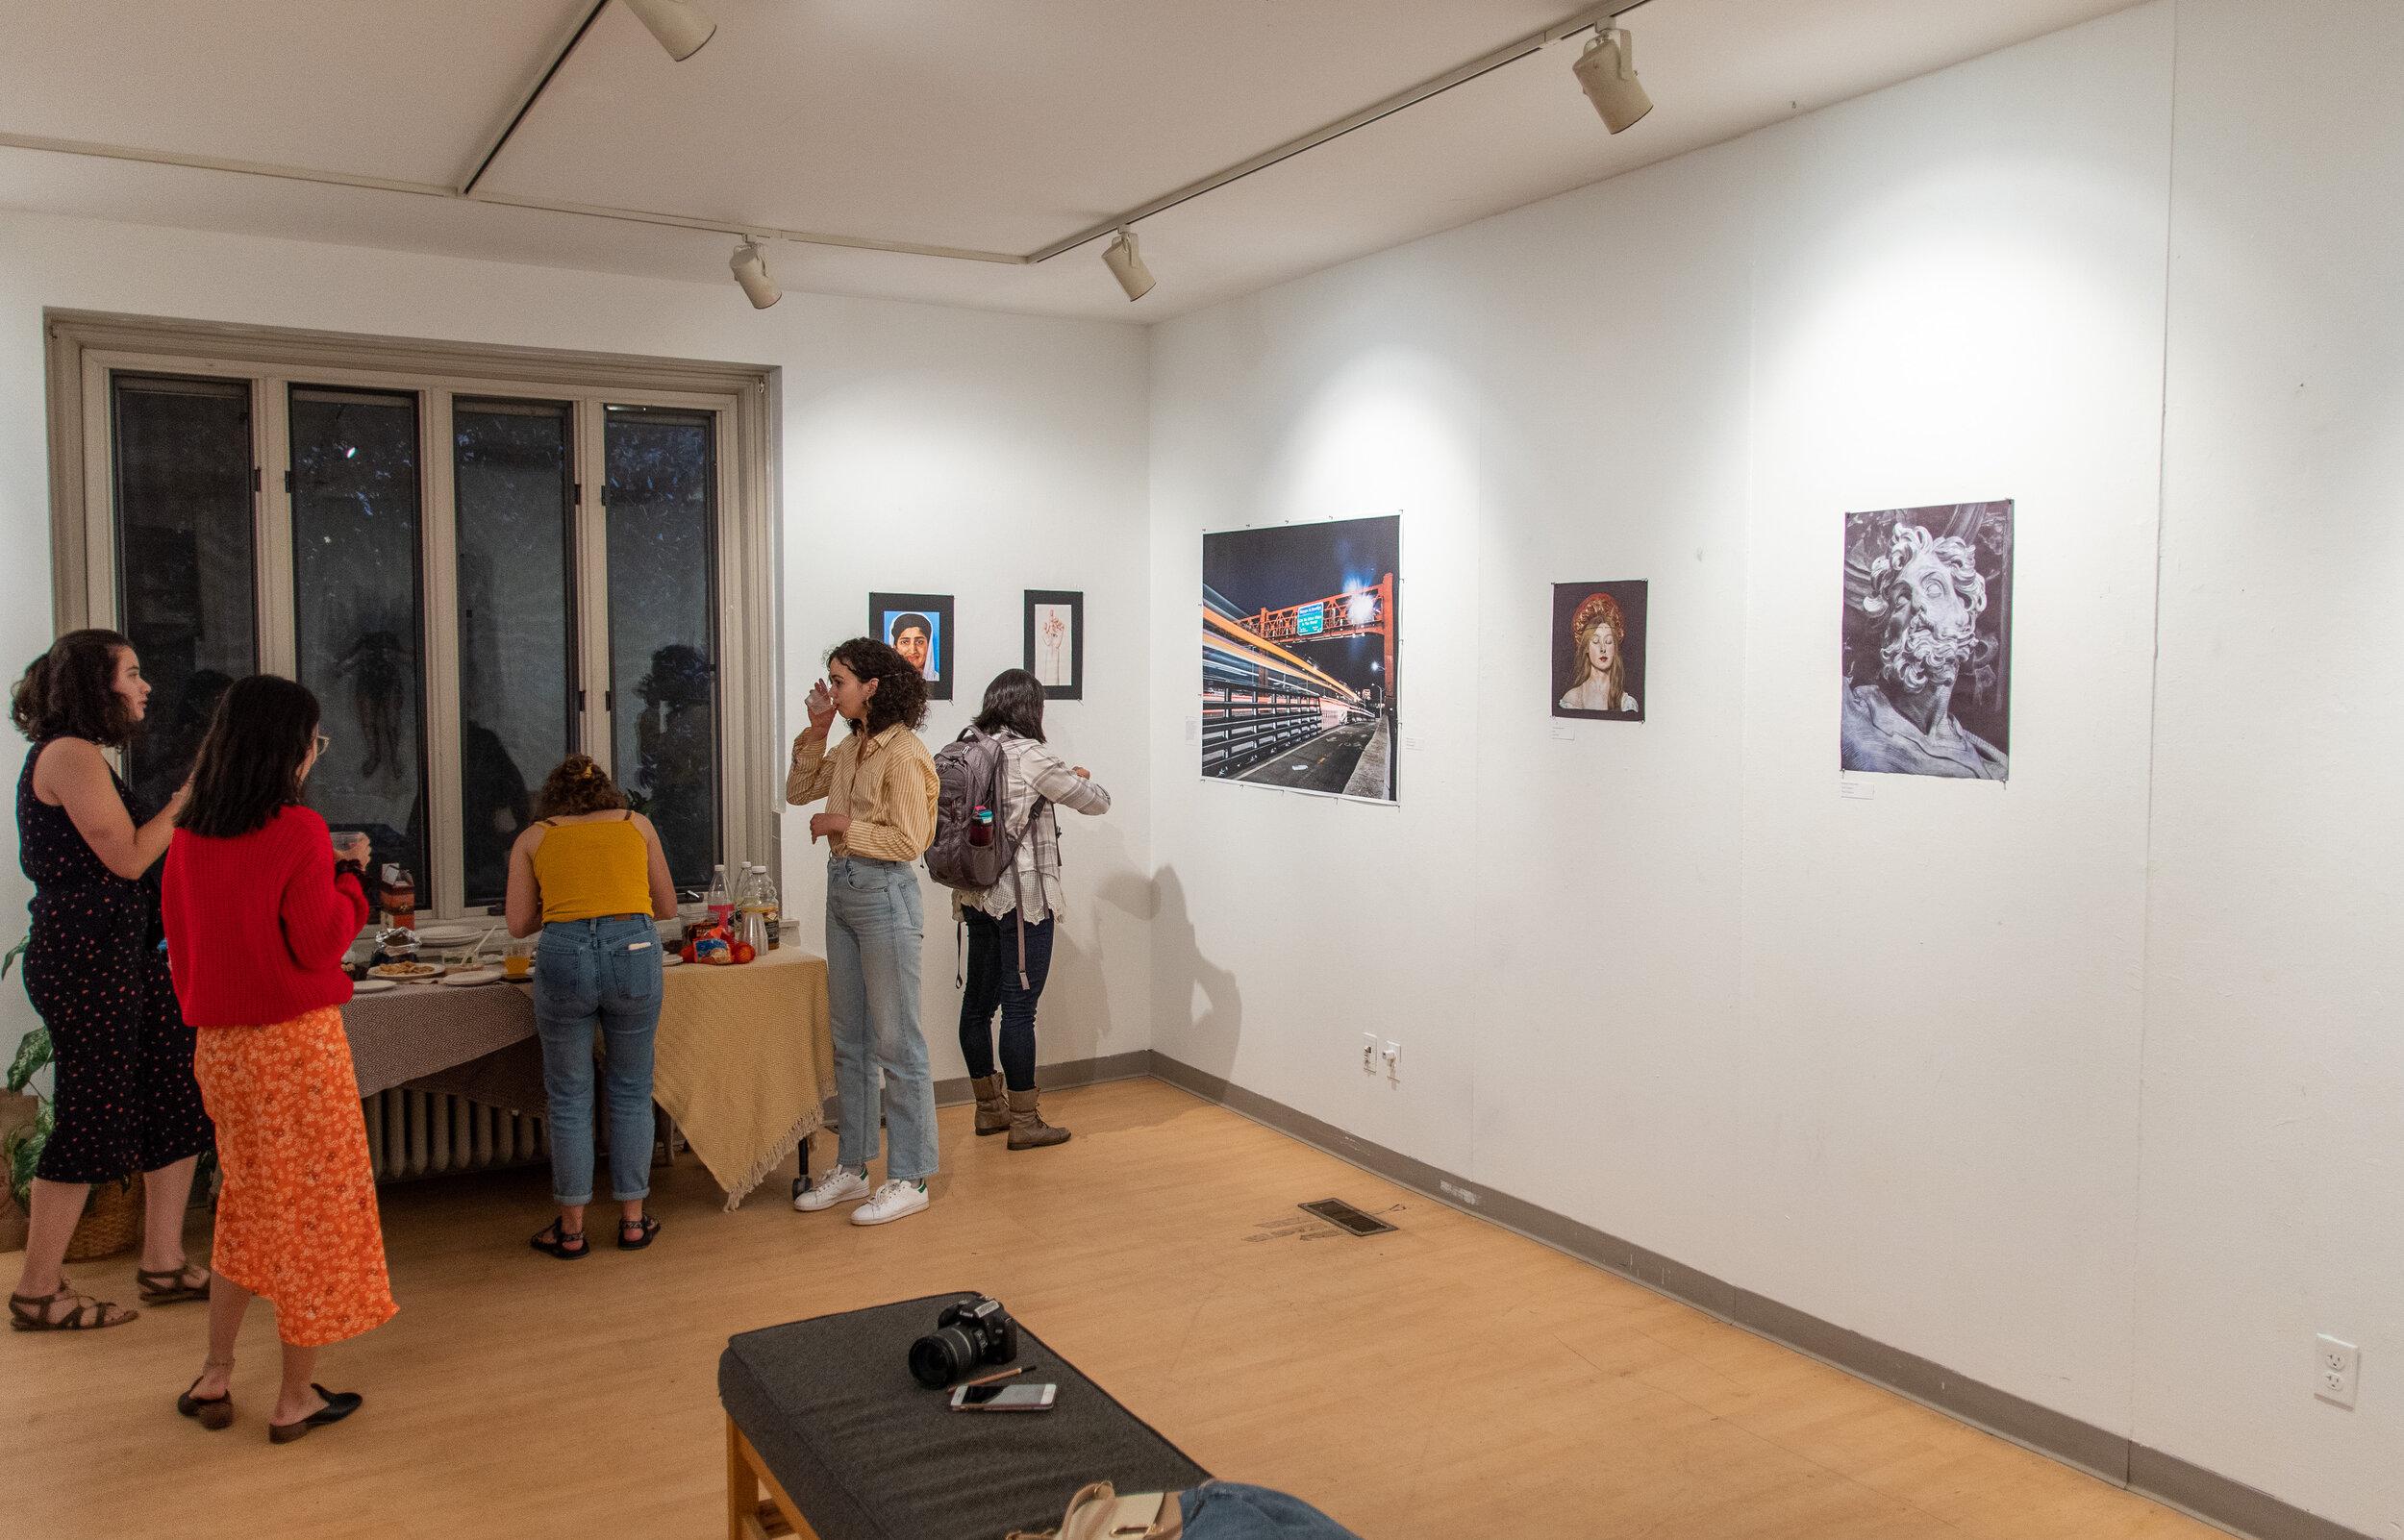 Attendees enjoy the artwork in Kitao Gallery.